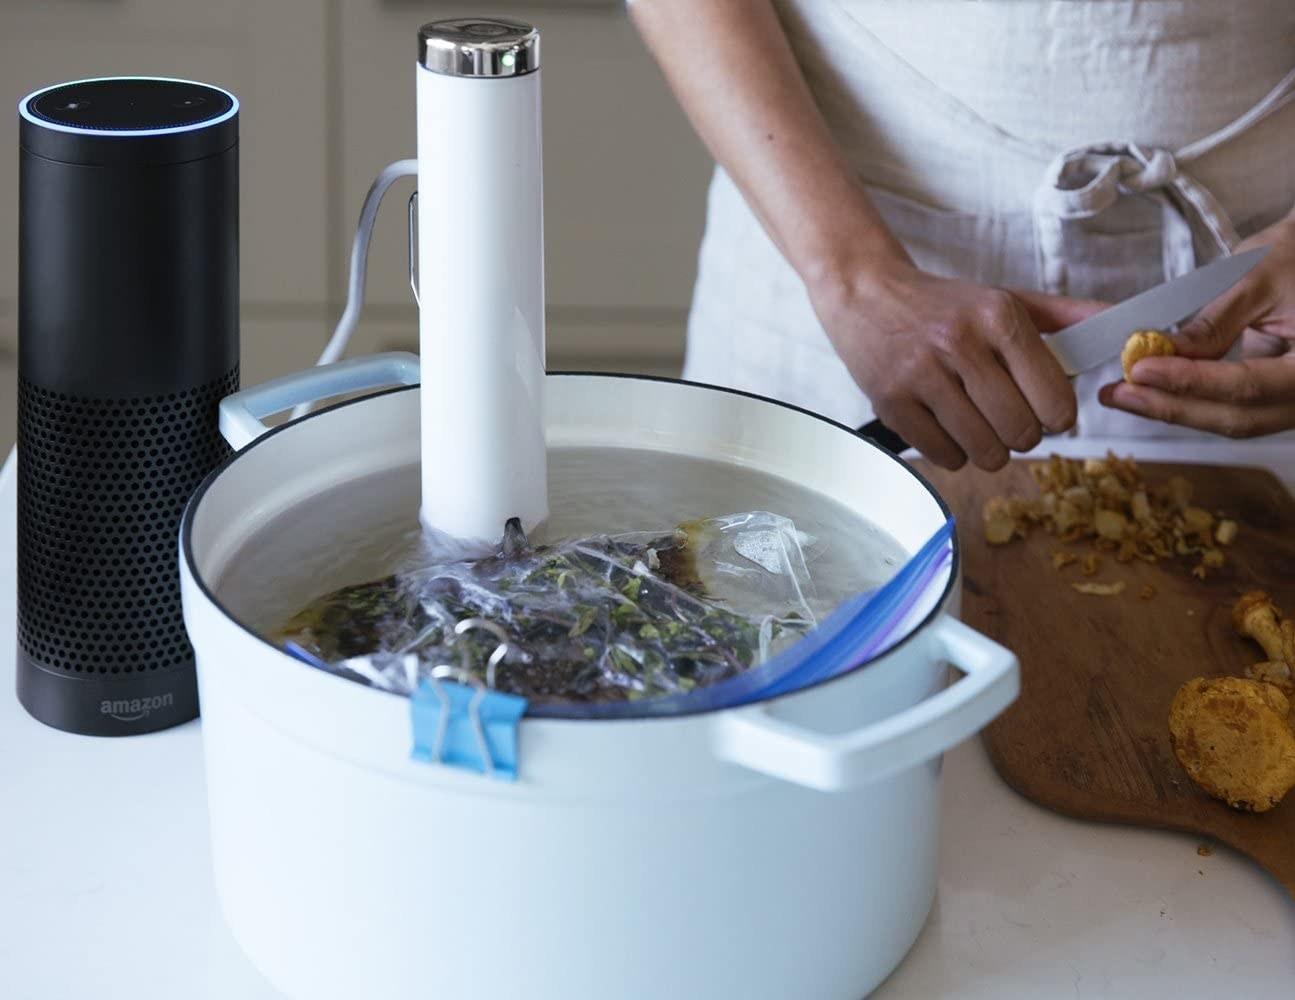 the sous vide in a pot